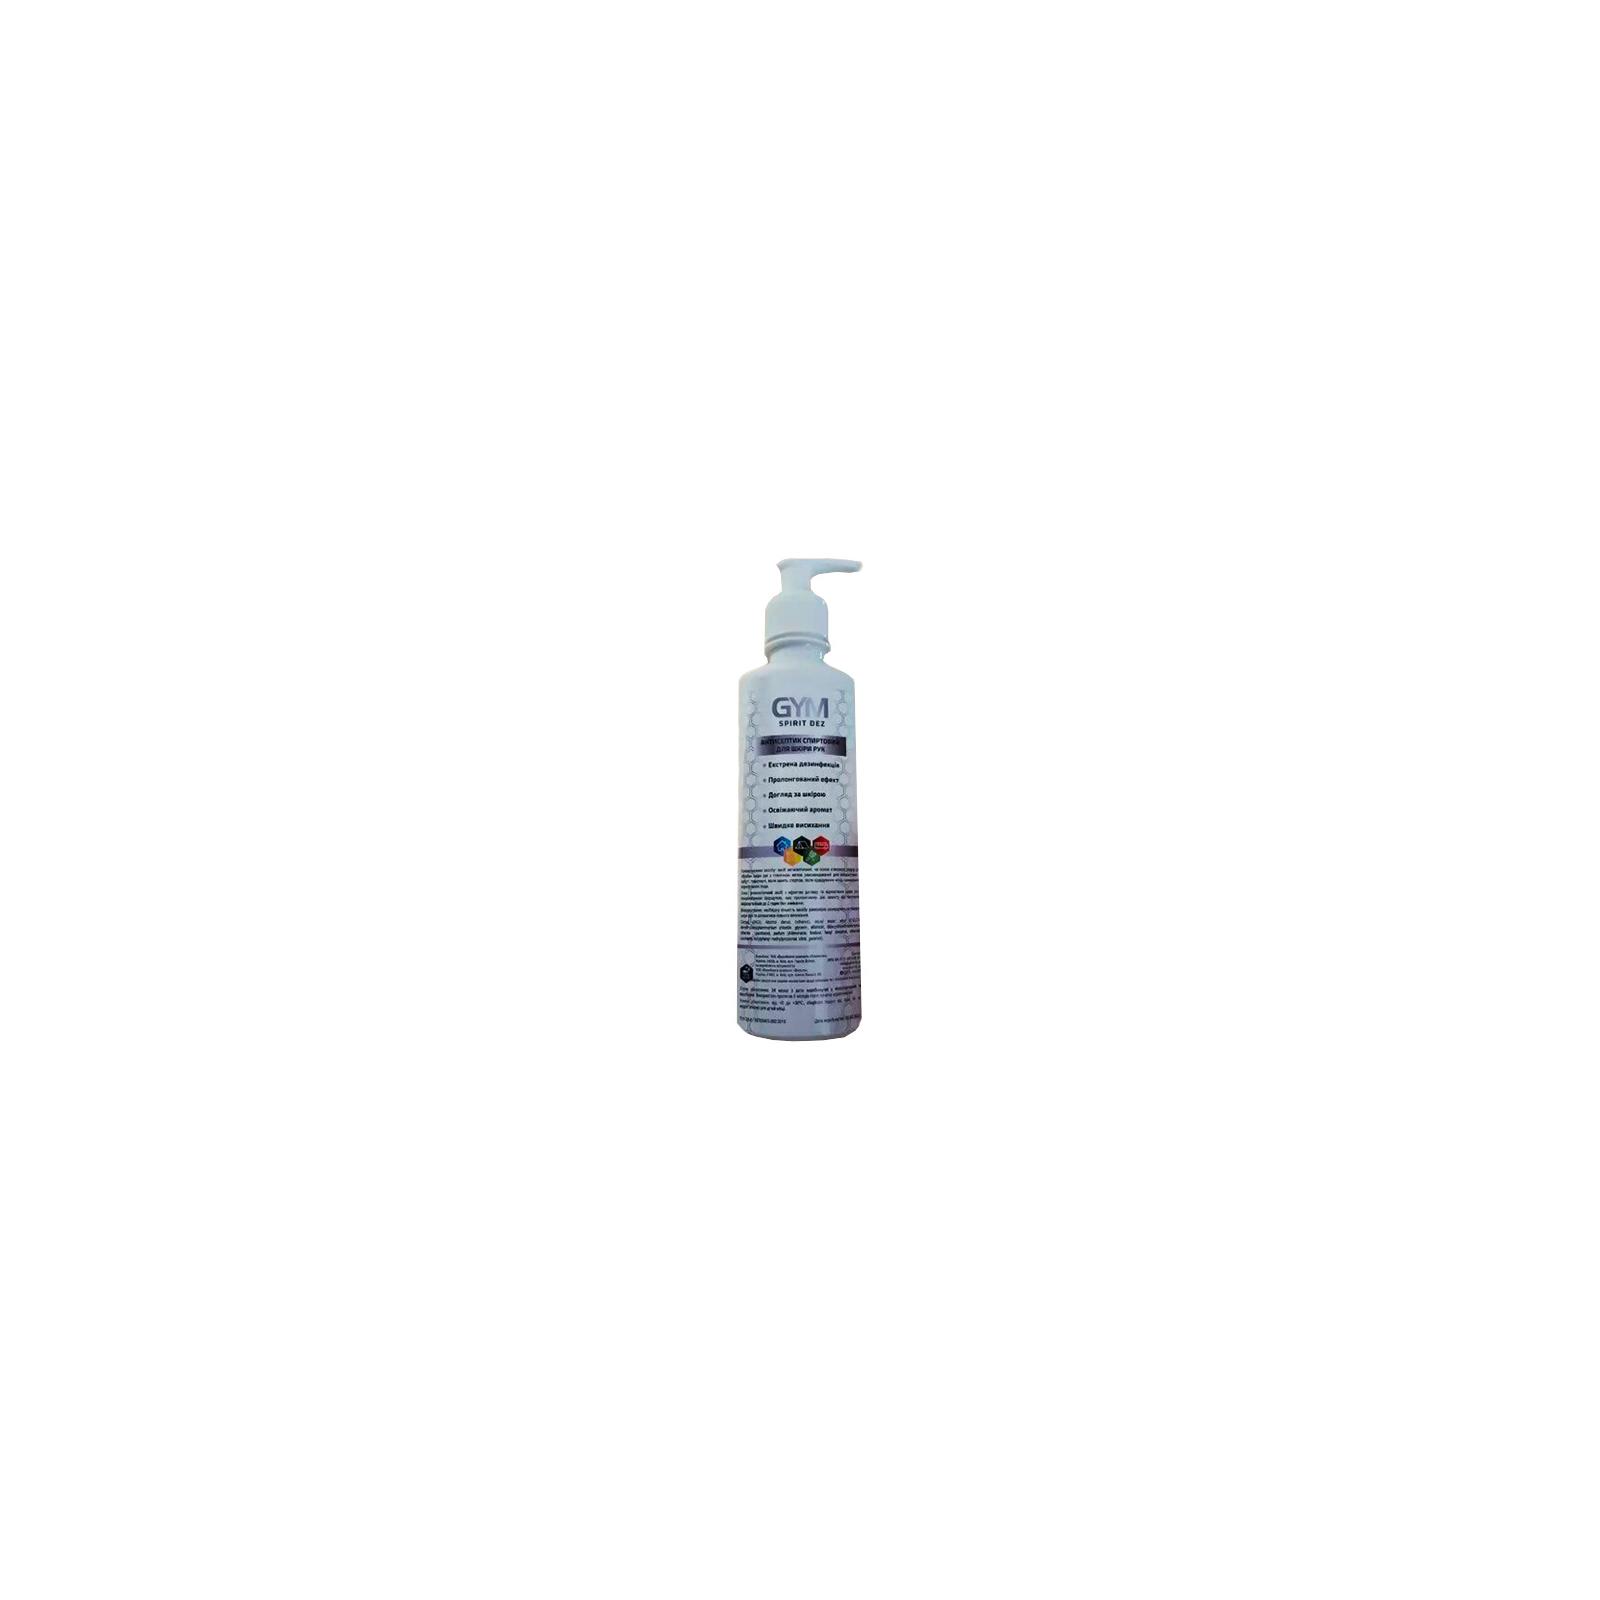 Антисептик для рук GYM Spirit DEZ, дозатор 200 мл (4820065574171)